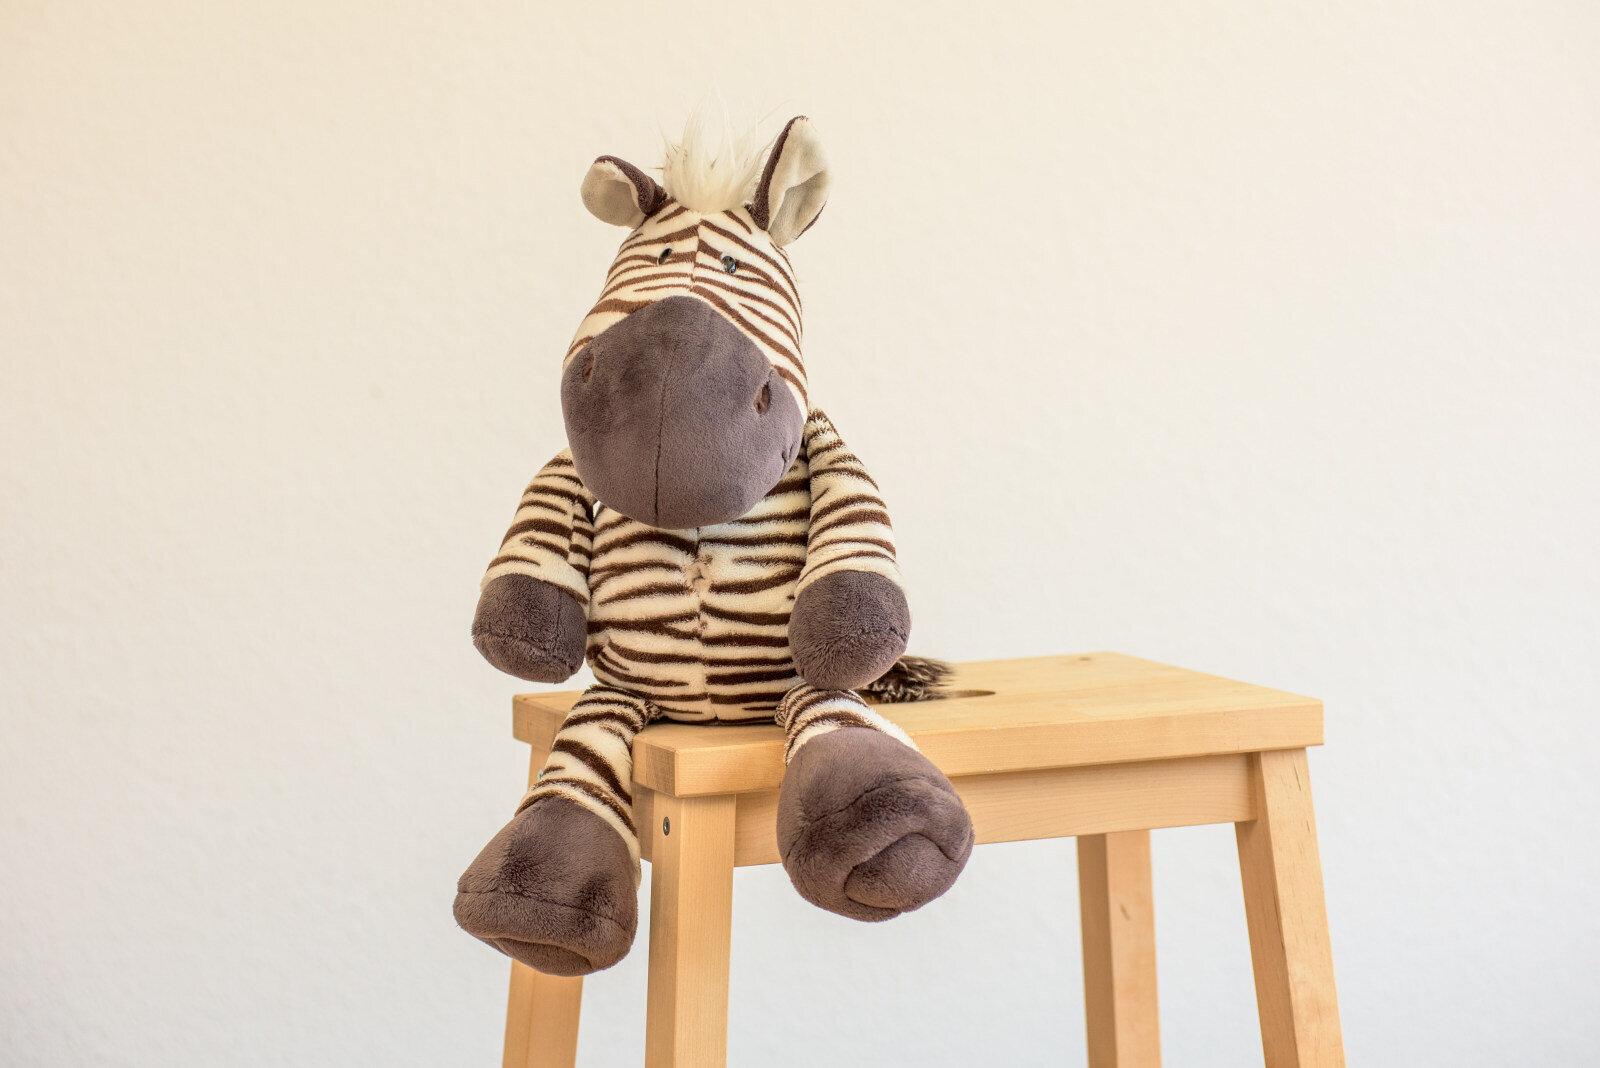 3a - Anton Zebra